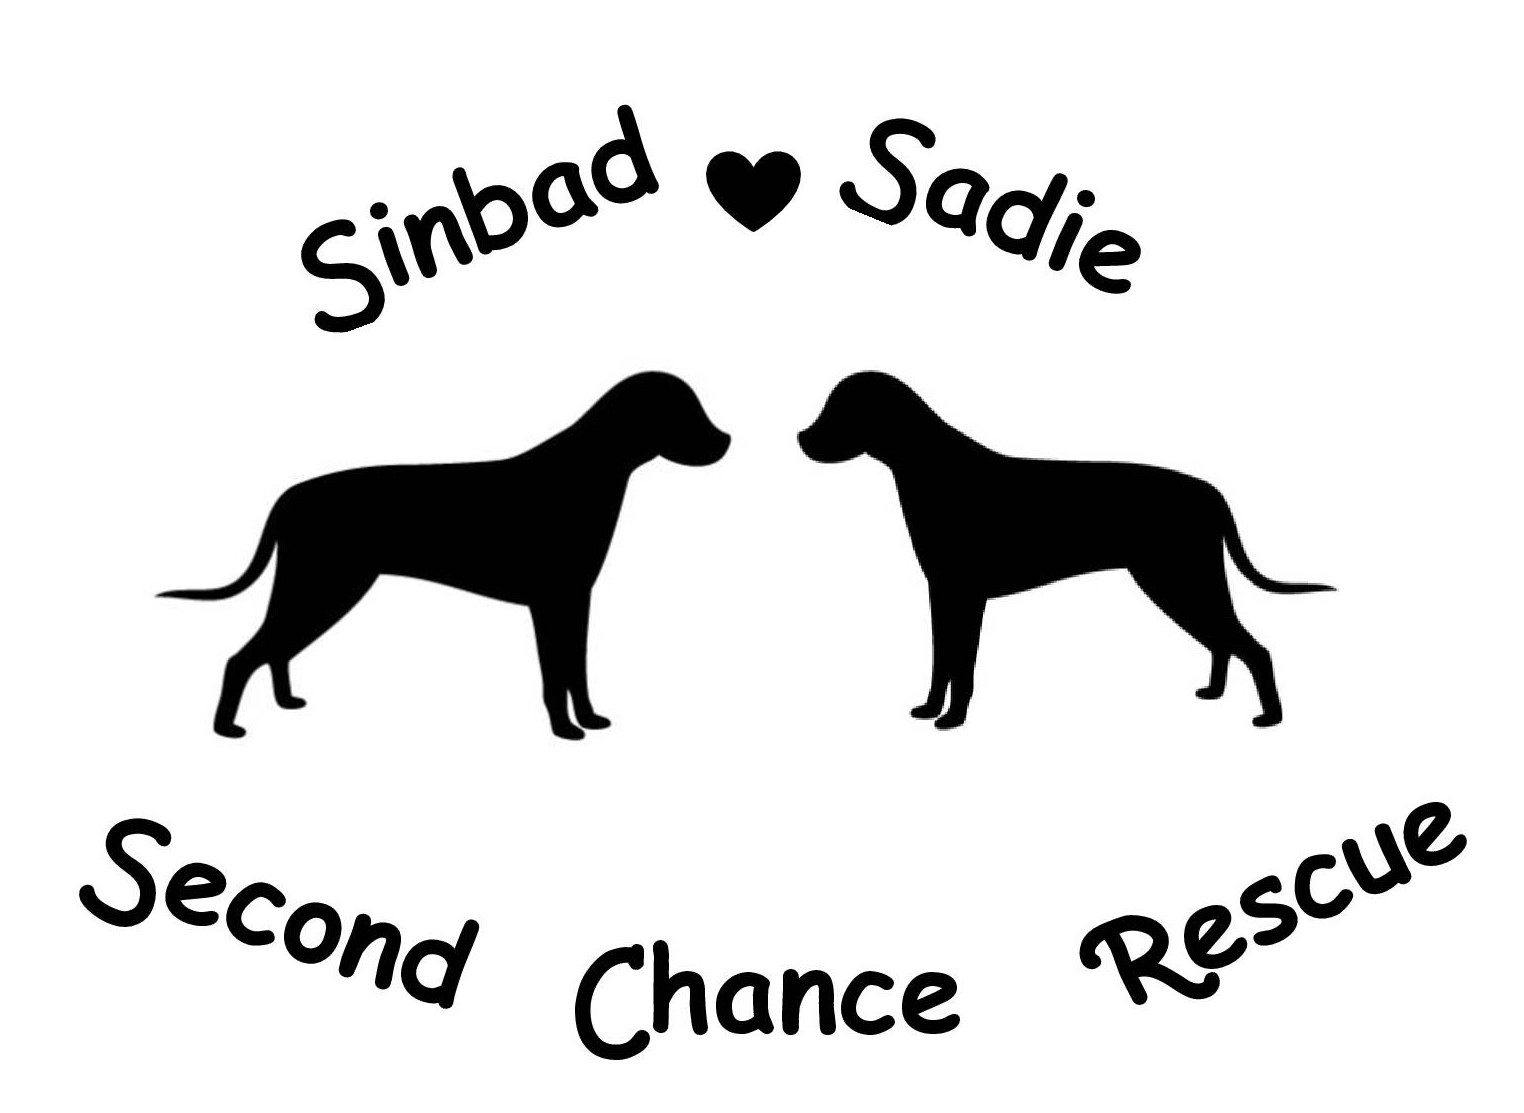 Sinbad-2 (4).jpg